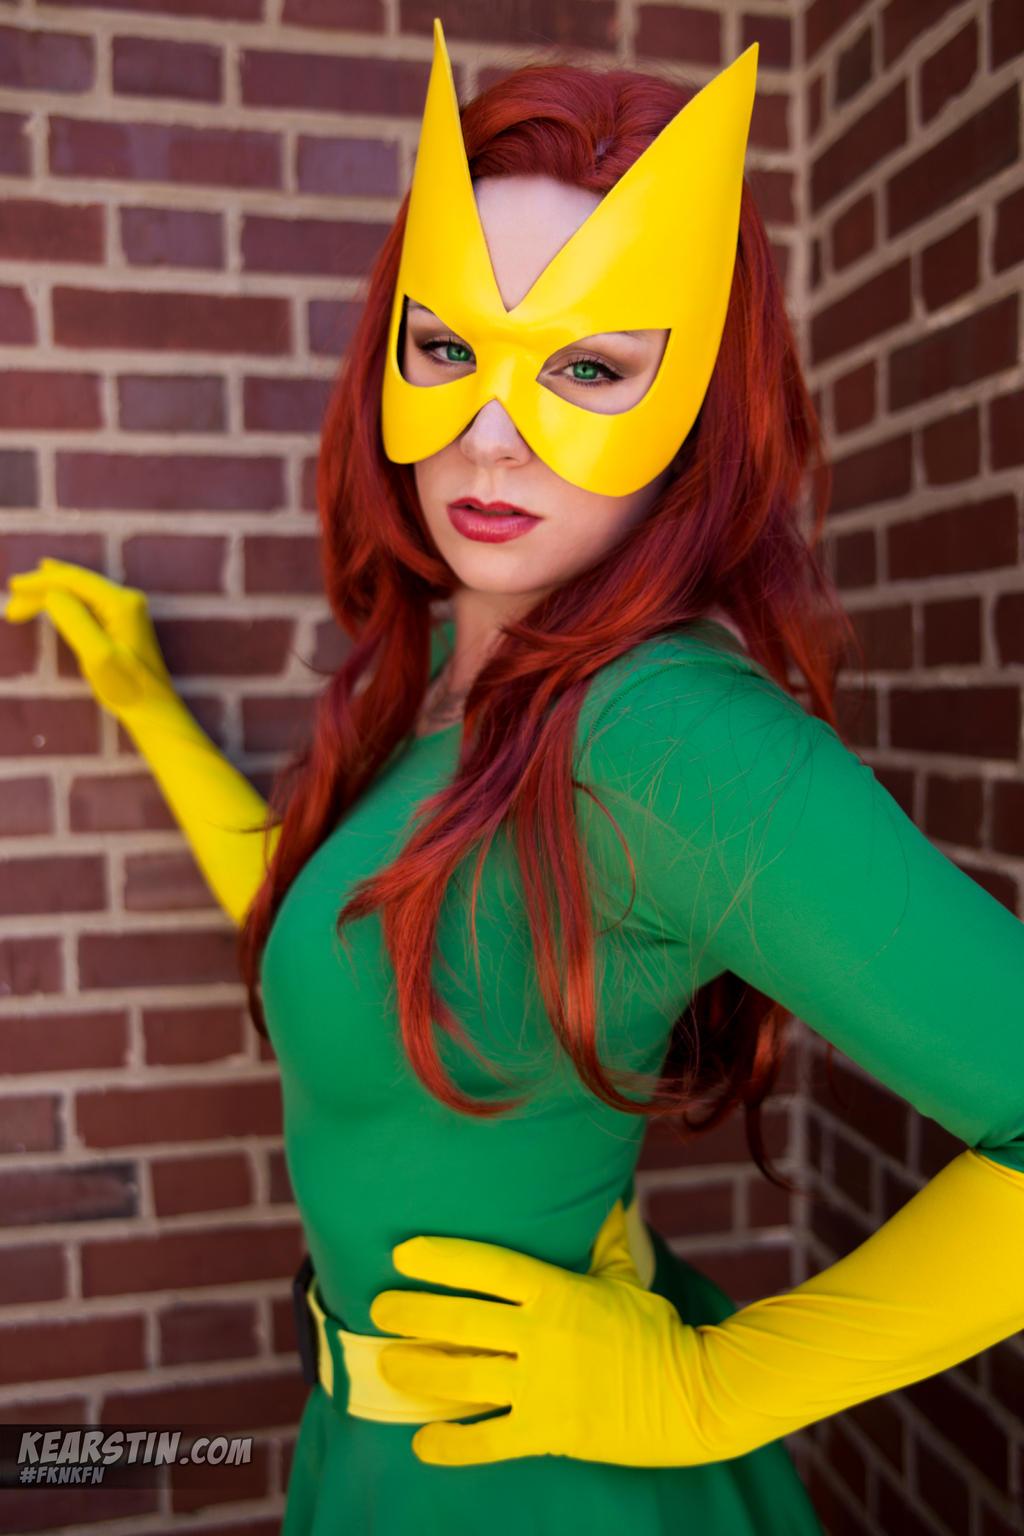 Marvel cosplay girls